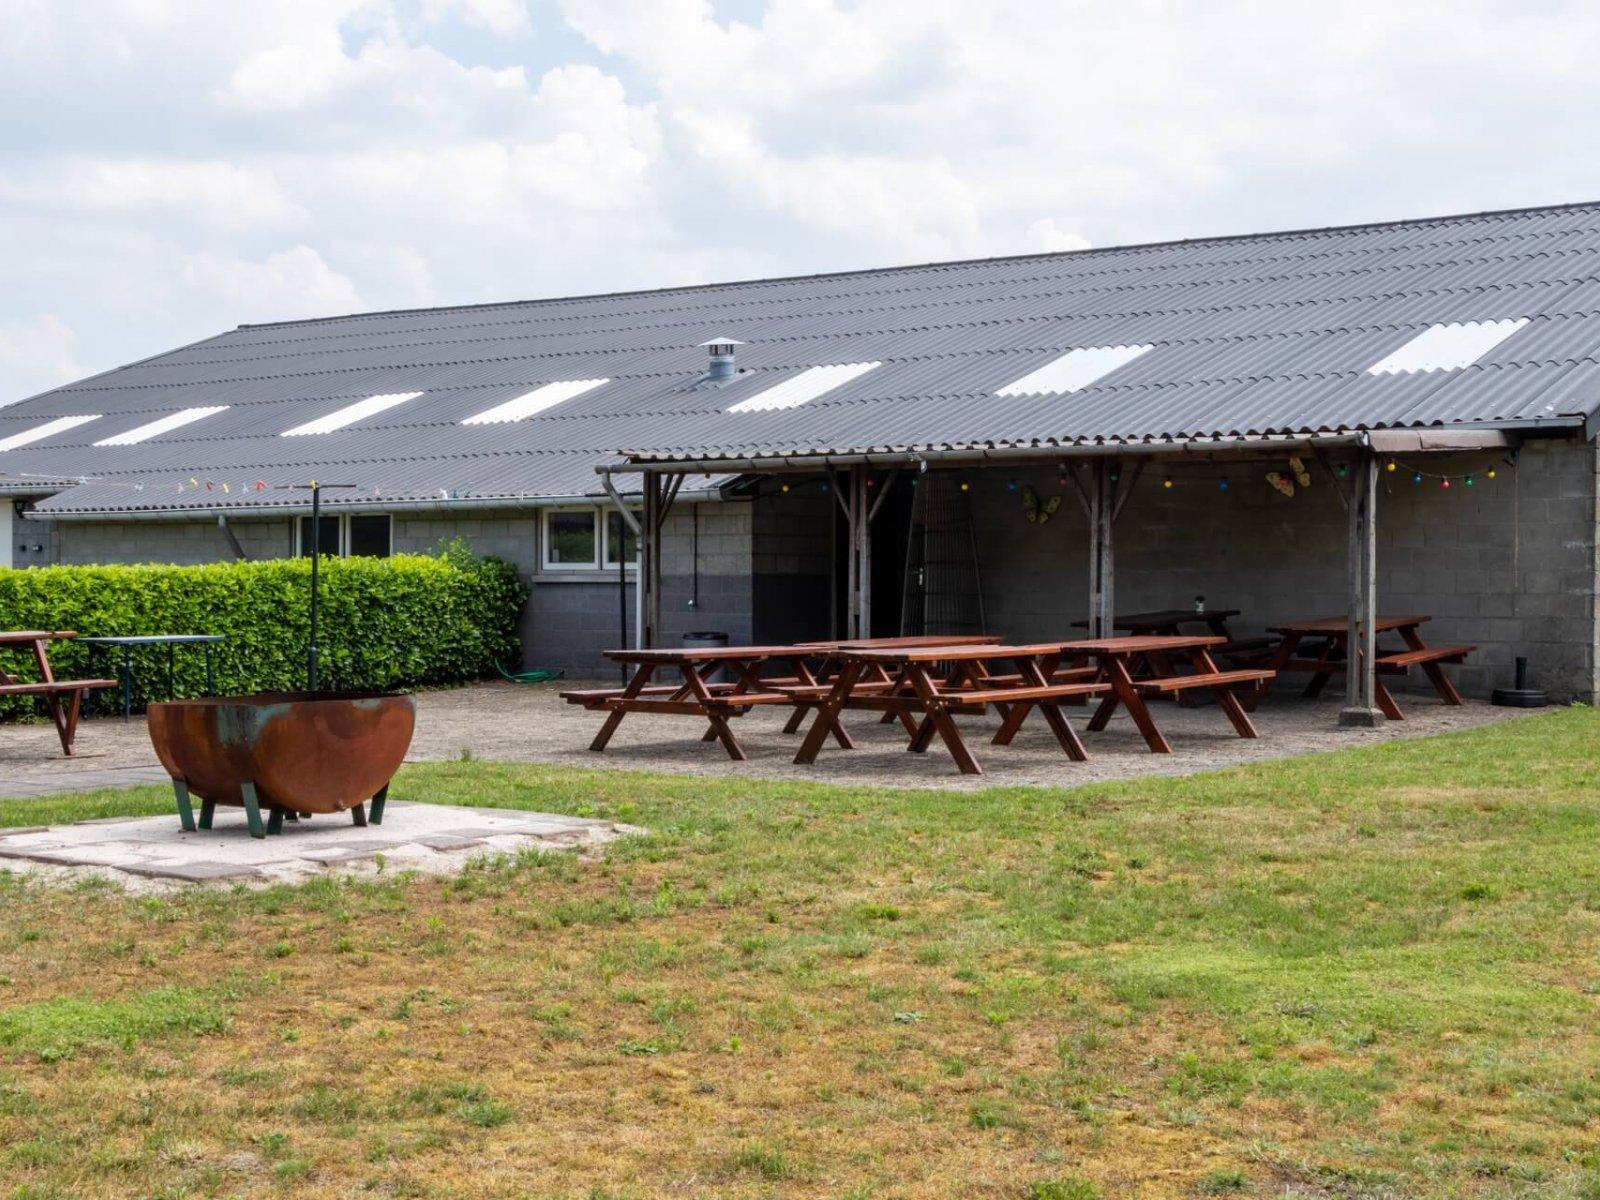 Kampeerboerderij-De-Reehoeve-Groepsaccommodatie-De-Reebok-recreatieveld-2-e1